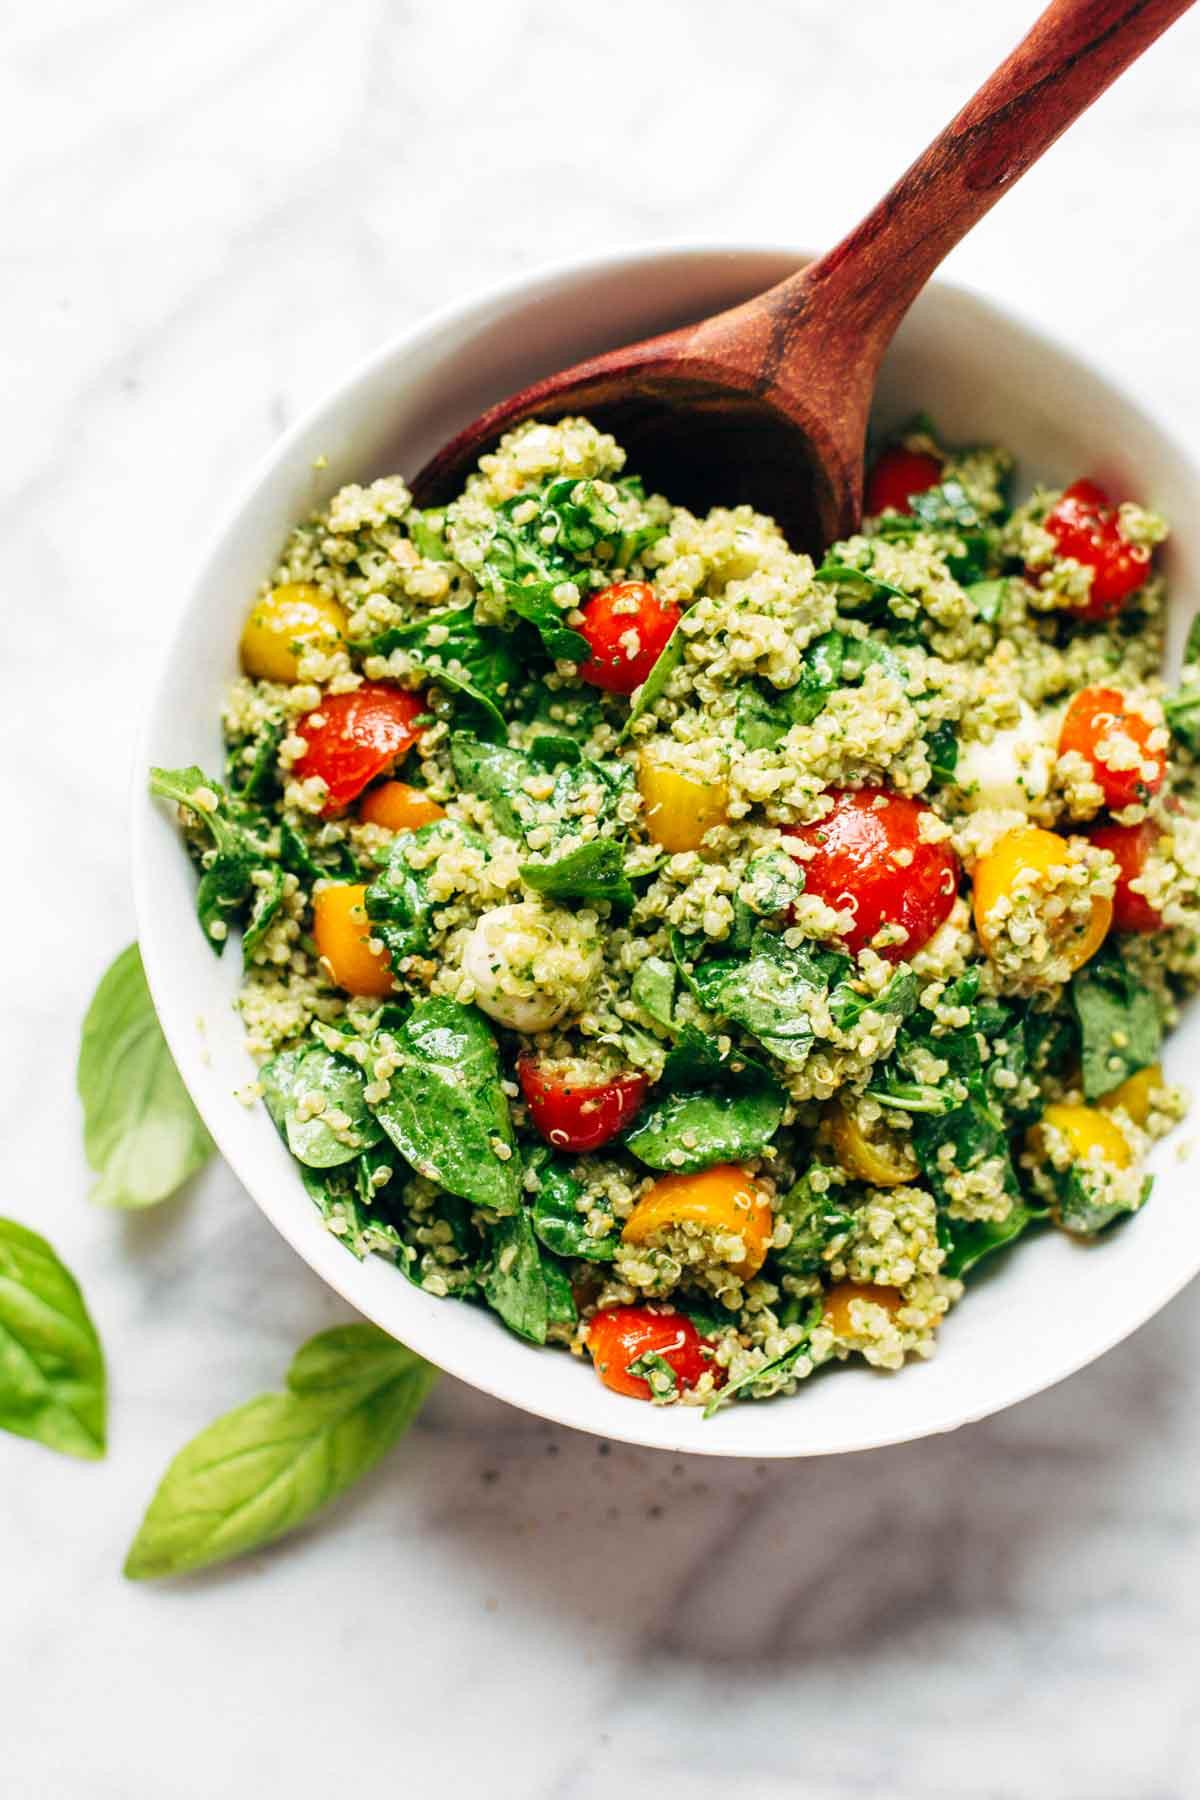 Summer Salad Recipes Vegetarian  Green Goddess Quinoa Summer Salad Recipe Pinch of Yum